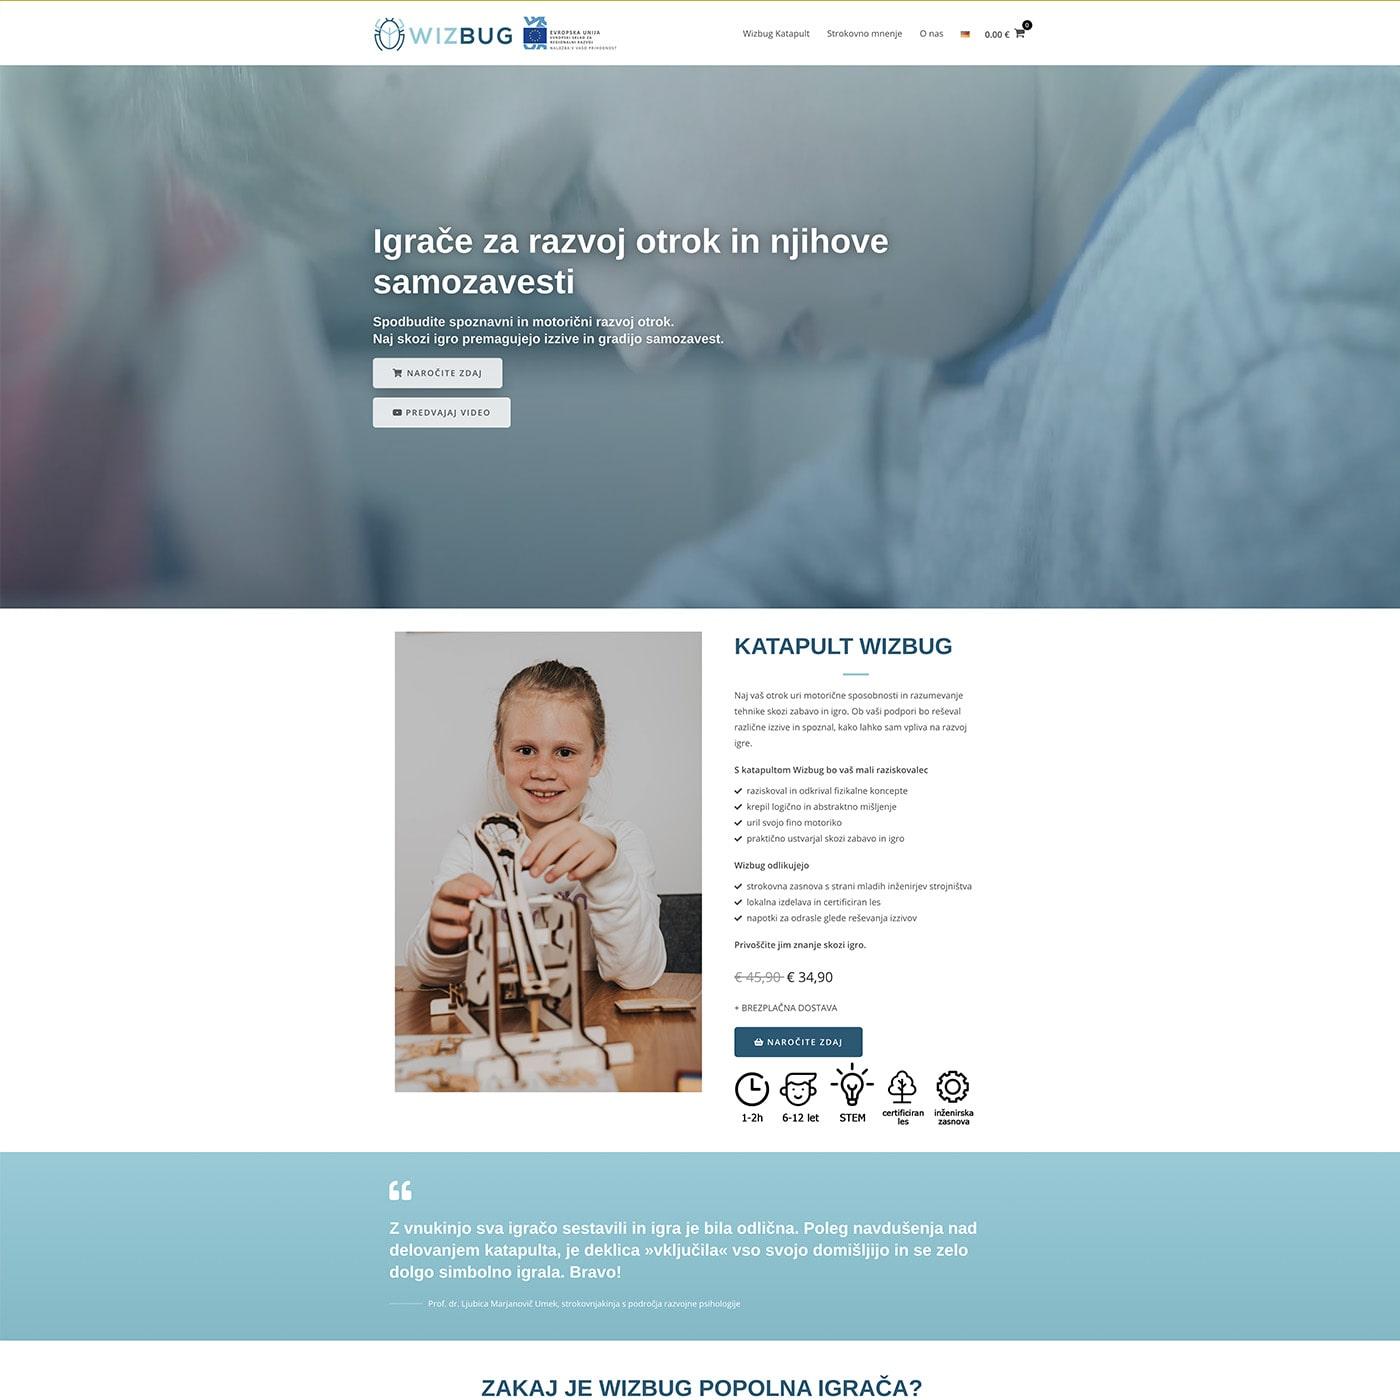 wizbug_trgovina_web-min (1)